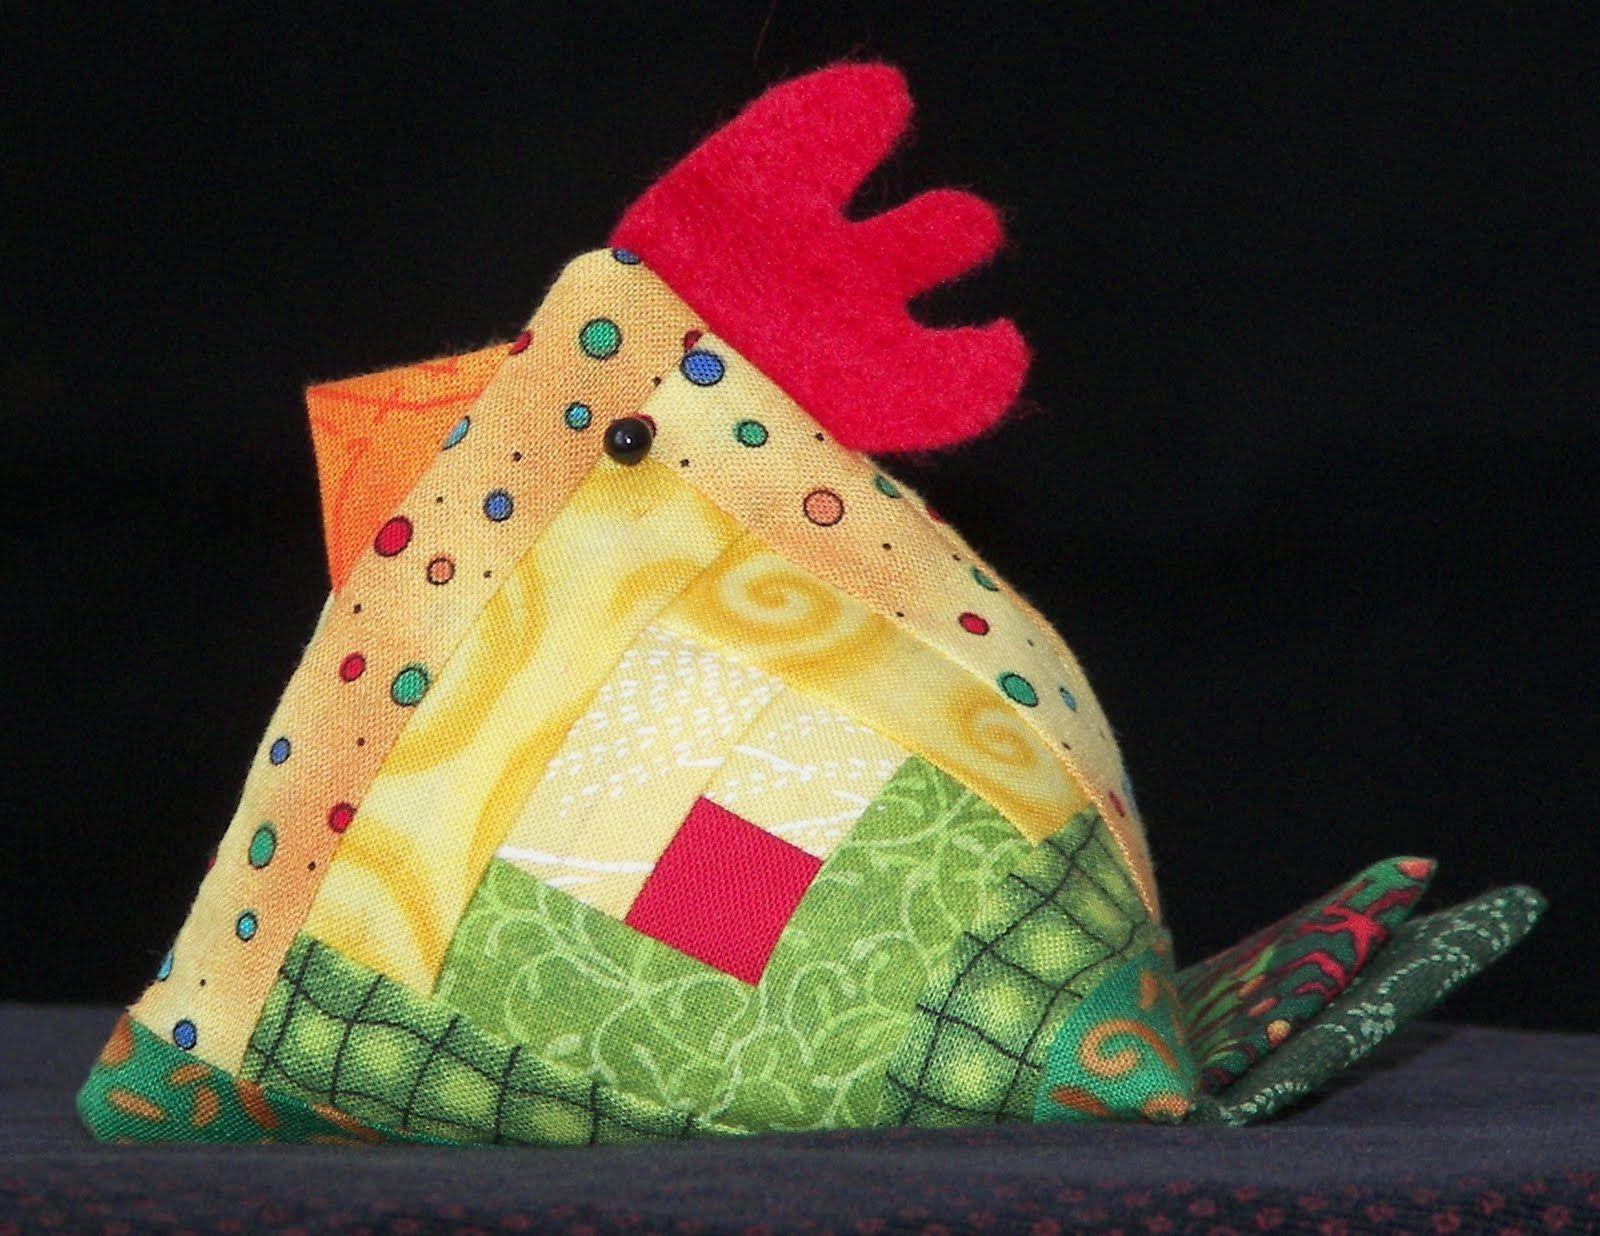 chicken and rooster block quilt pattern | trusty log cabin chicken ... : quilted pincushion patterns - Adamdwight.com